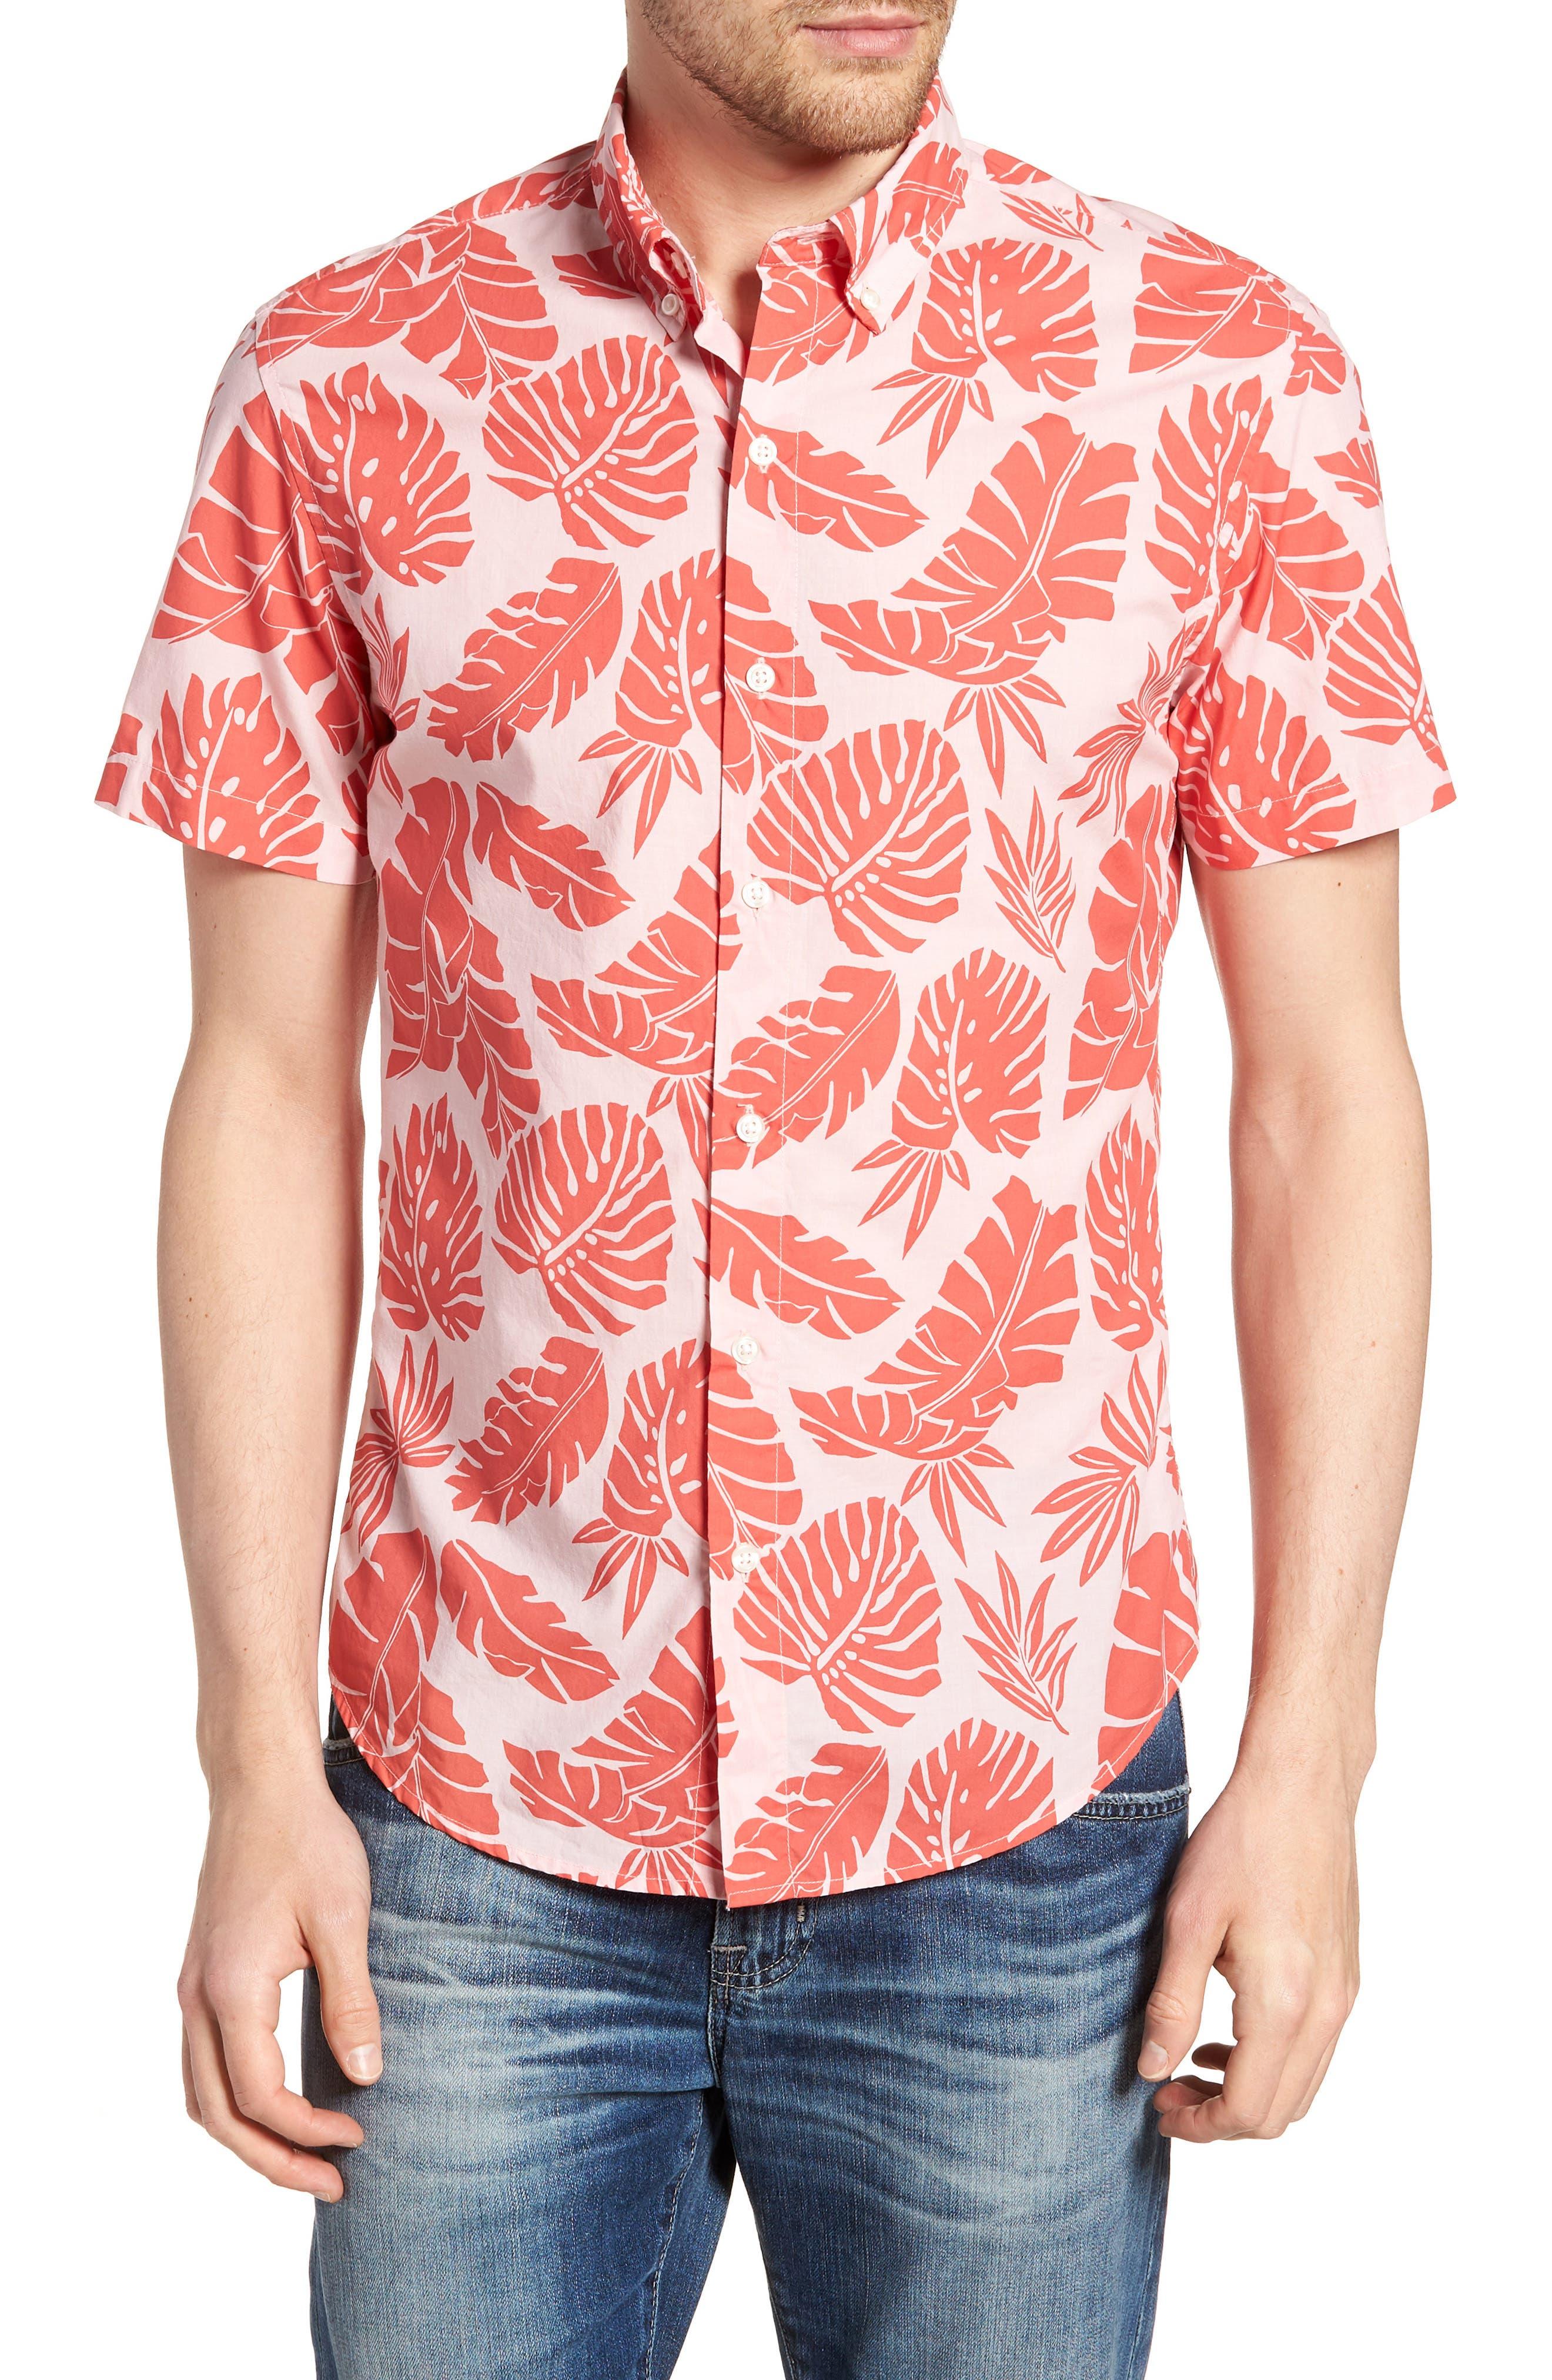 Riviera Slim Fit Palm Print Sport Shirt,                             Main thumbnail 1, color,                             PALM SCATTER - CORAL FAN